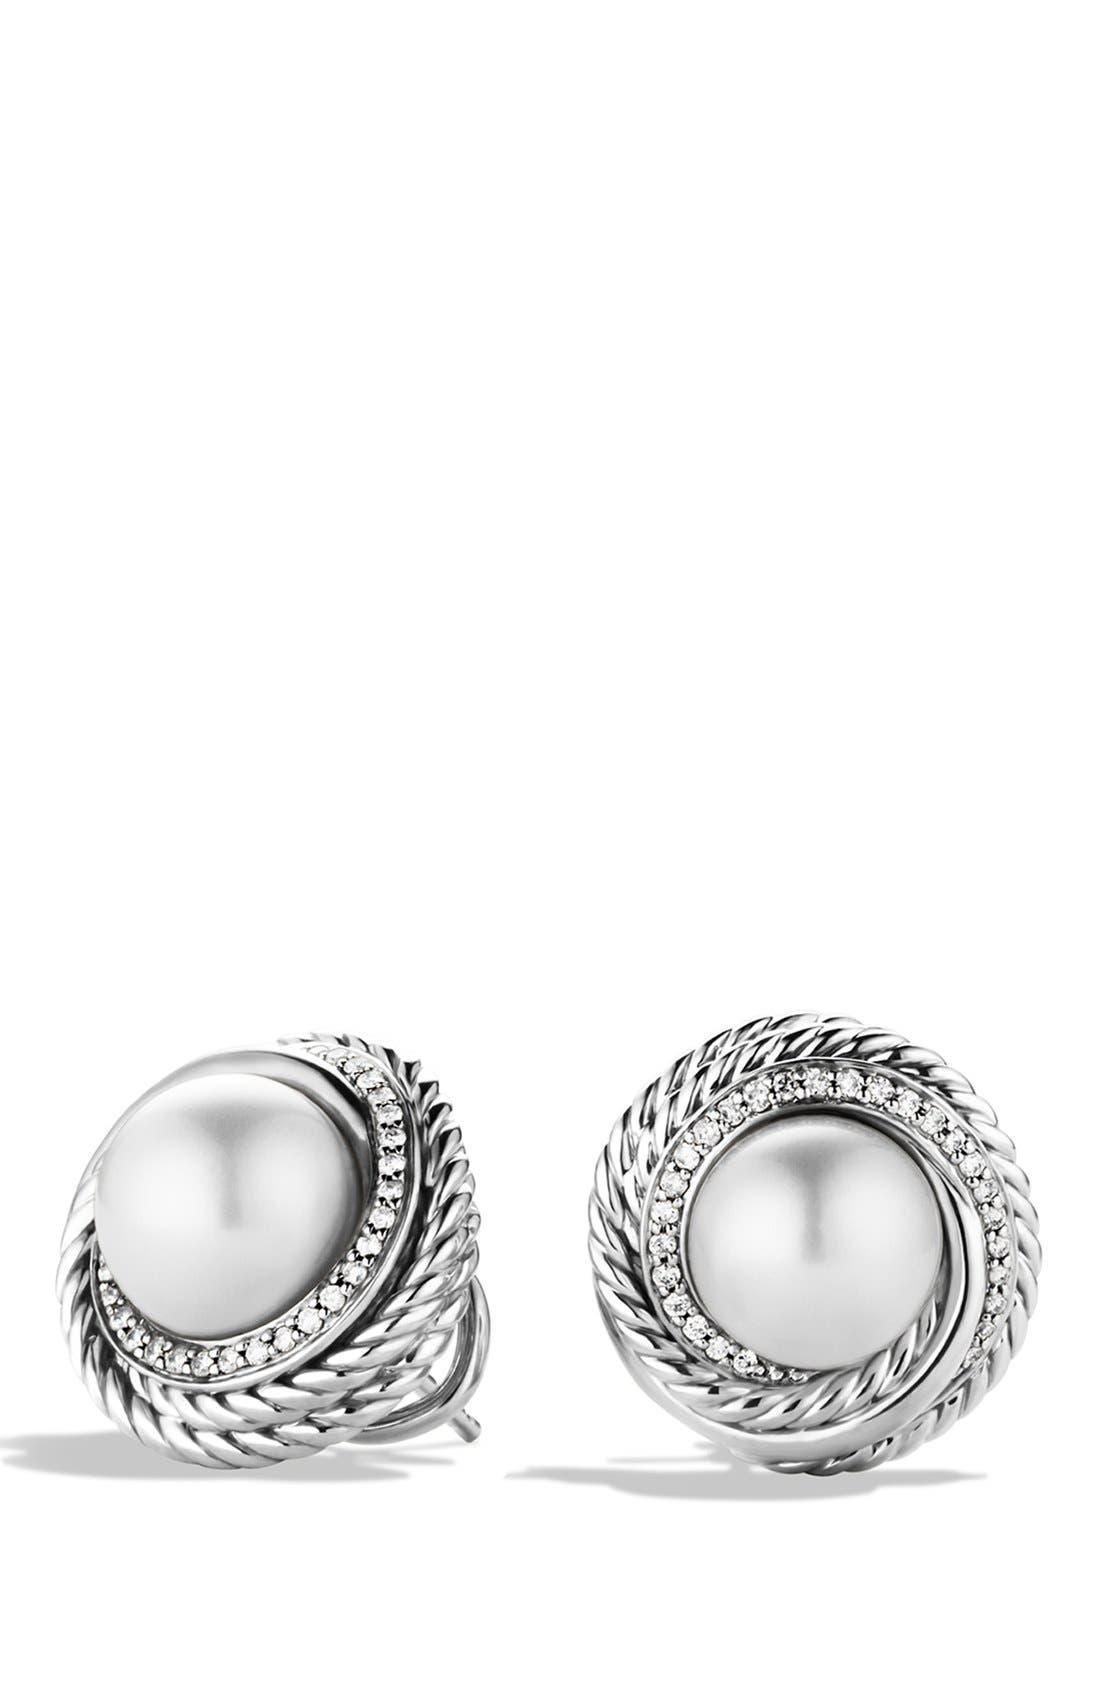 Alternate Image 1 Selected - David Yurman 'Pearl Crossover' Earrings with Diamonds